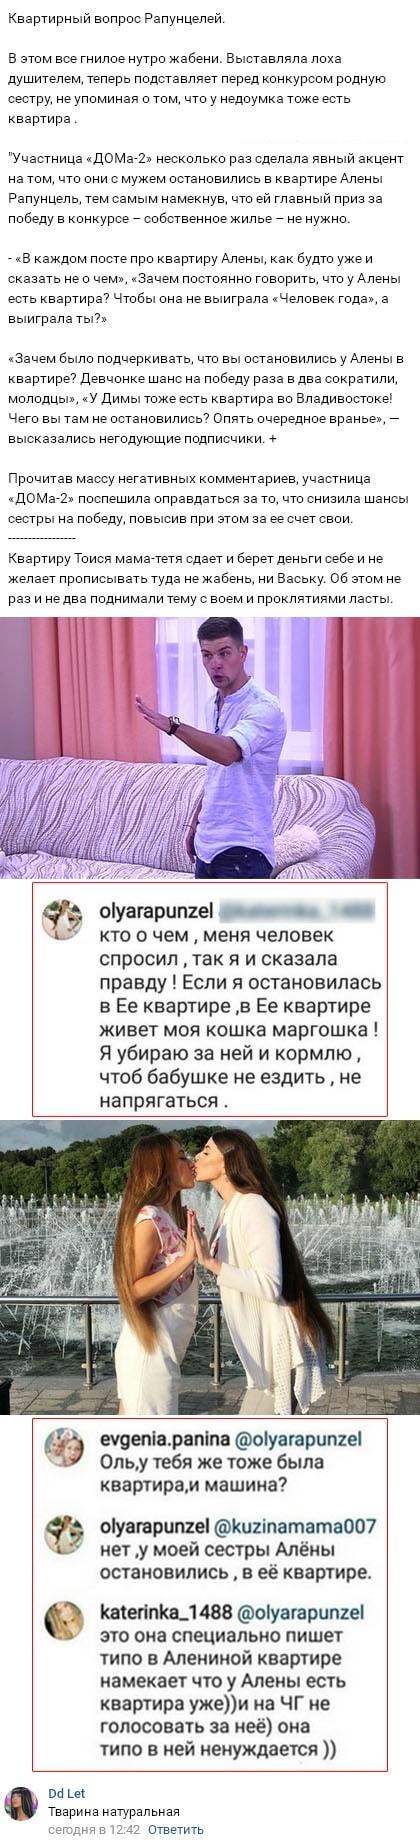 Ольга Рапунцель подставила сестру на конкурсе Человек года